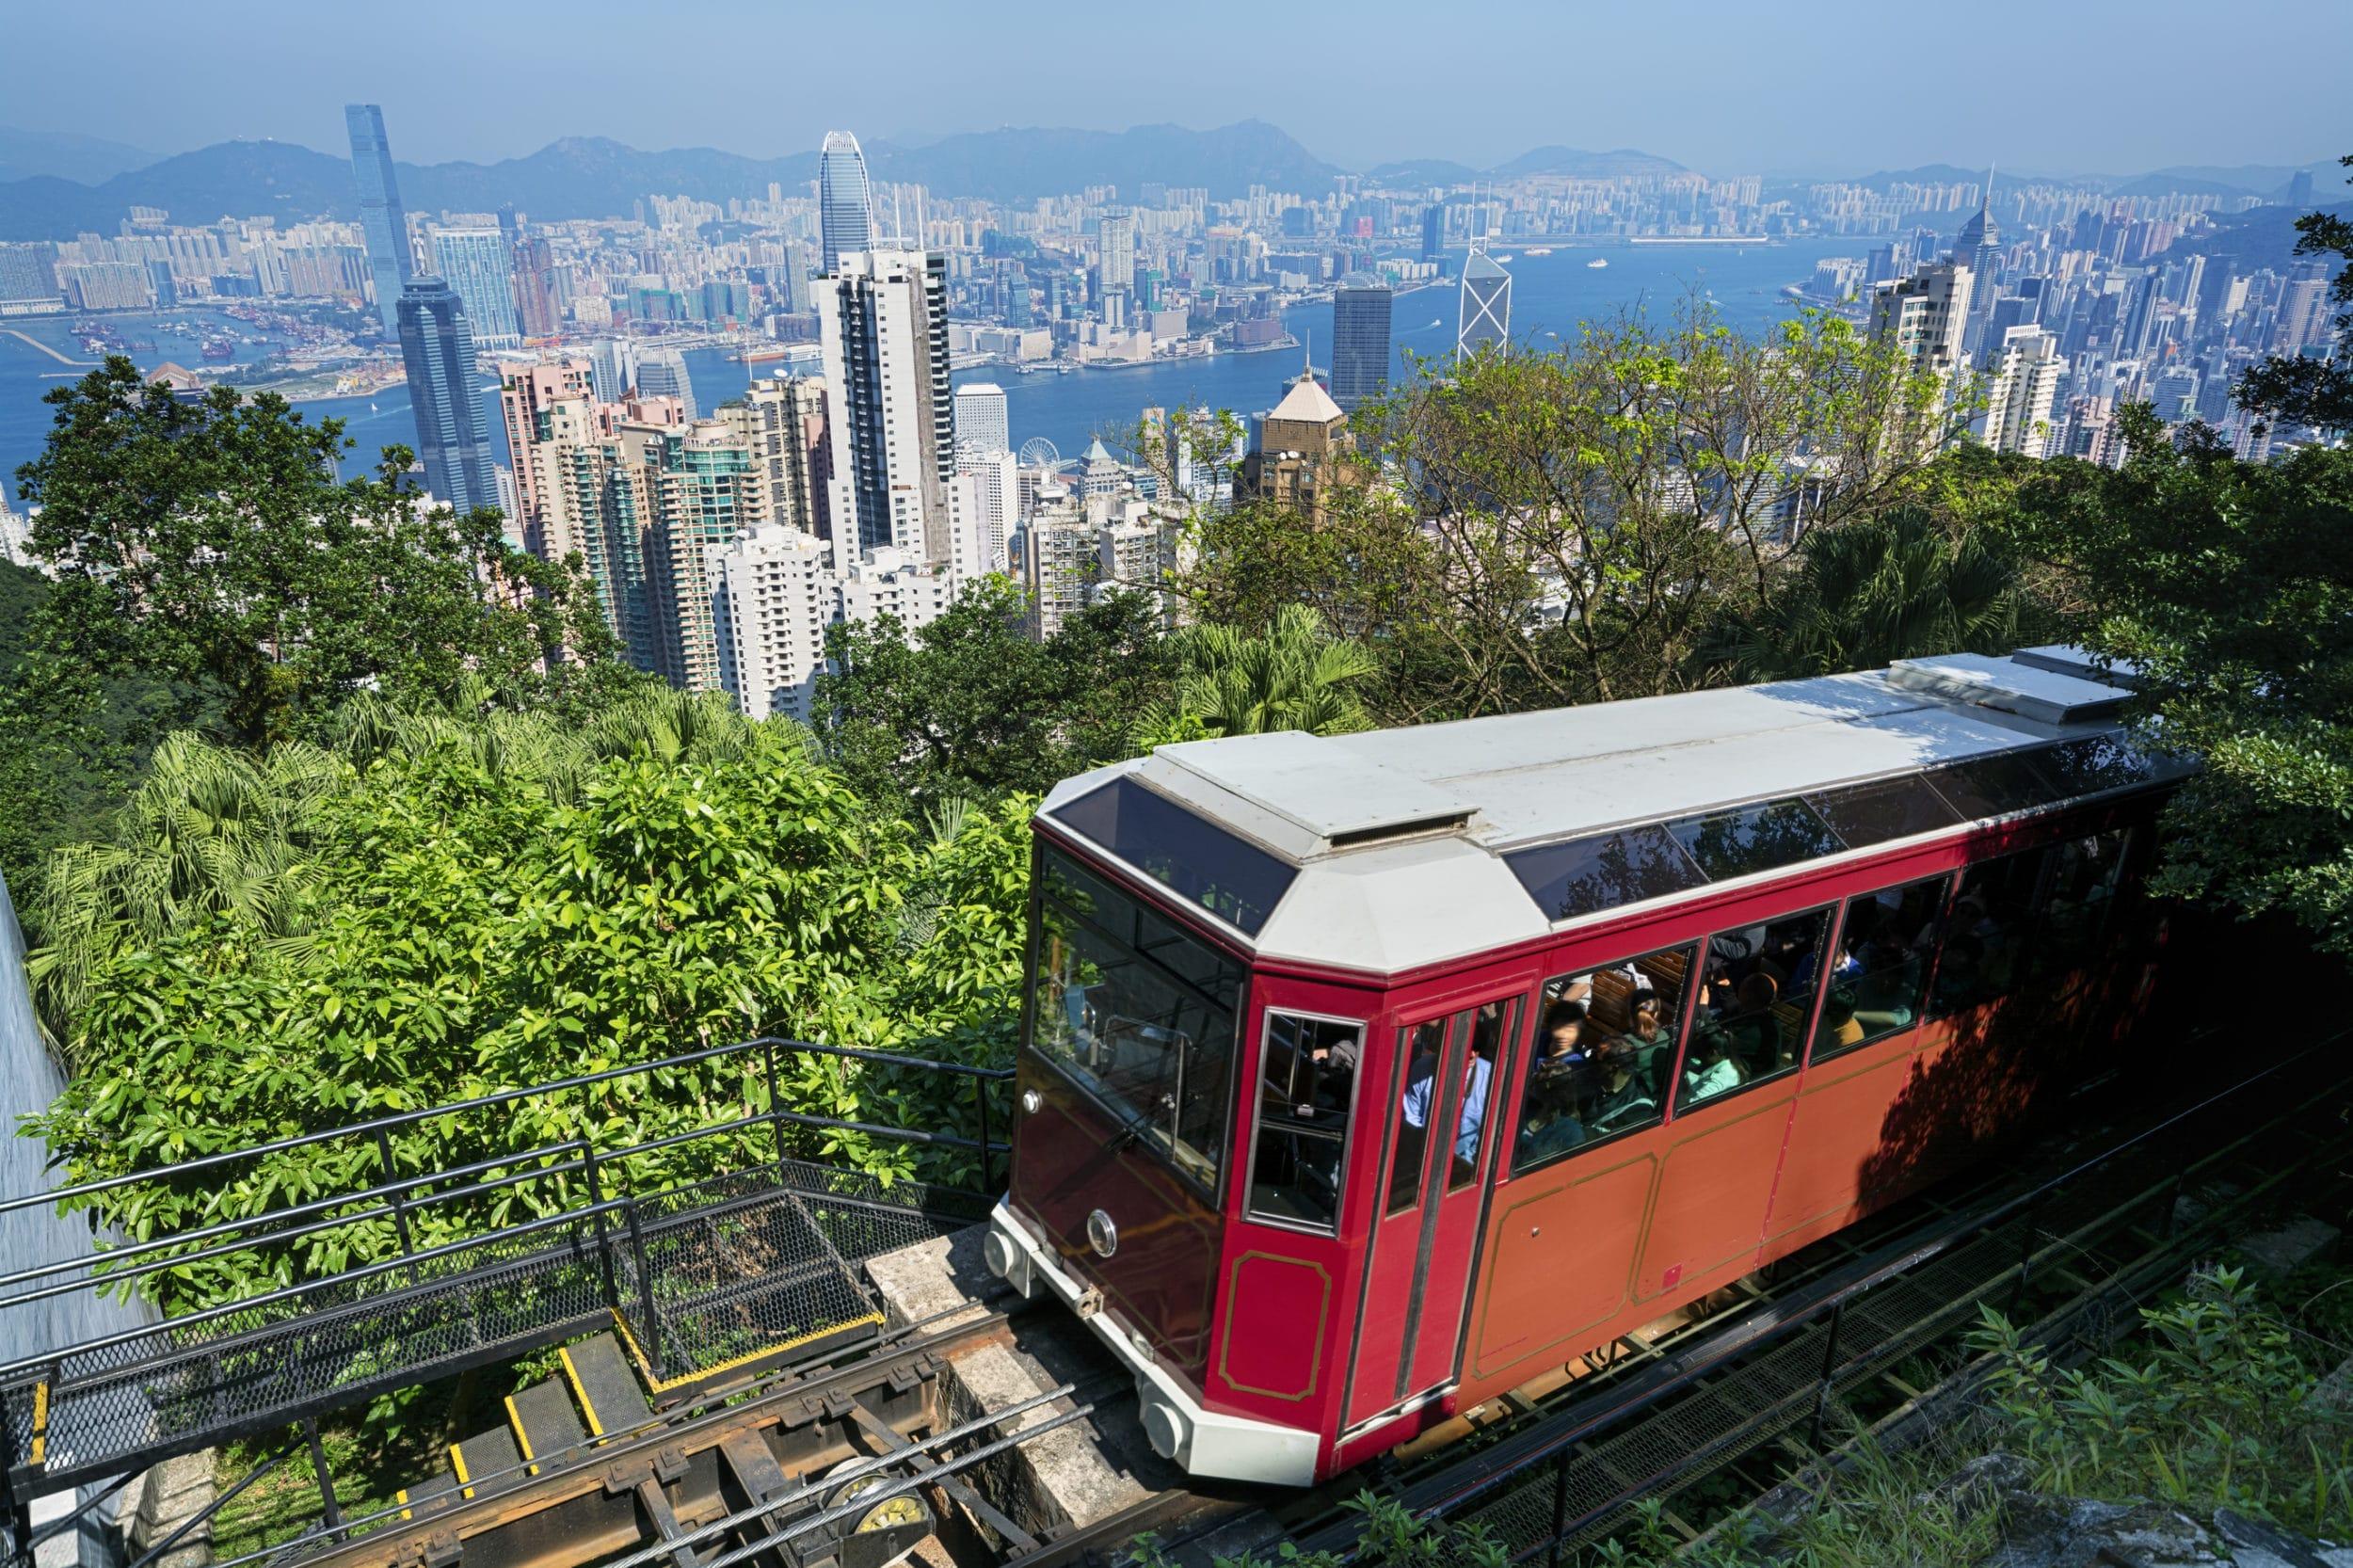 The Peak Tram going uphill